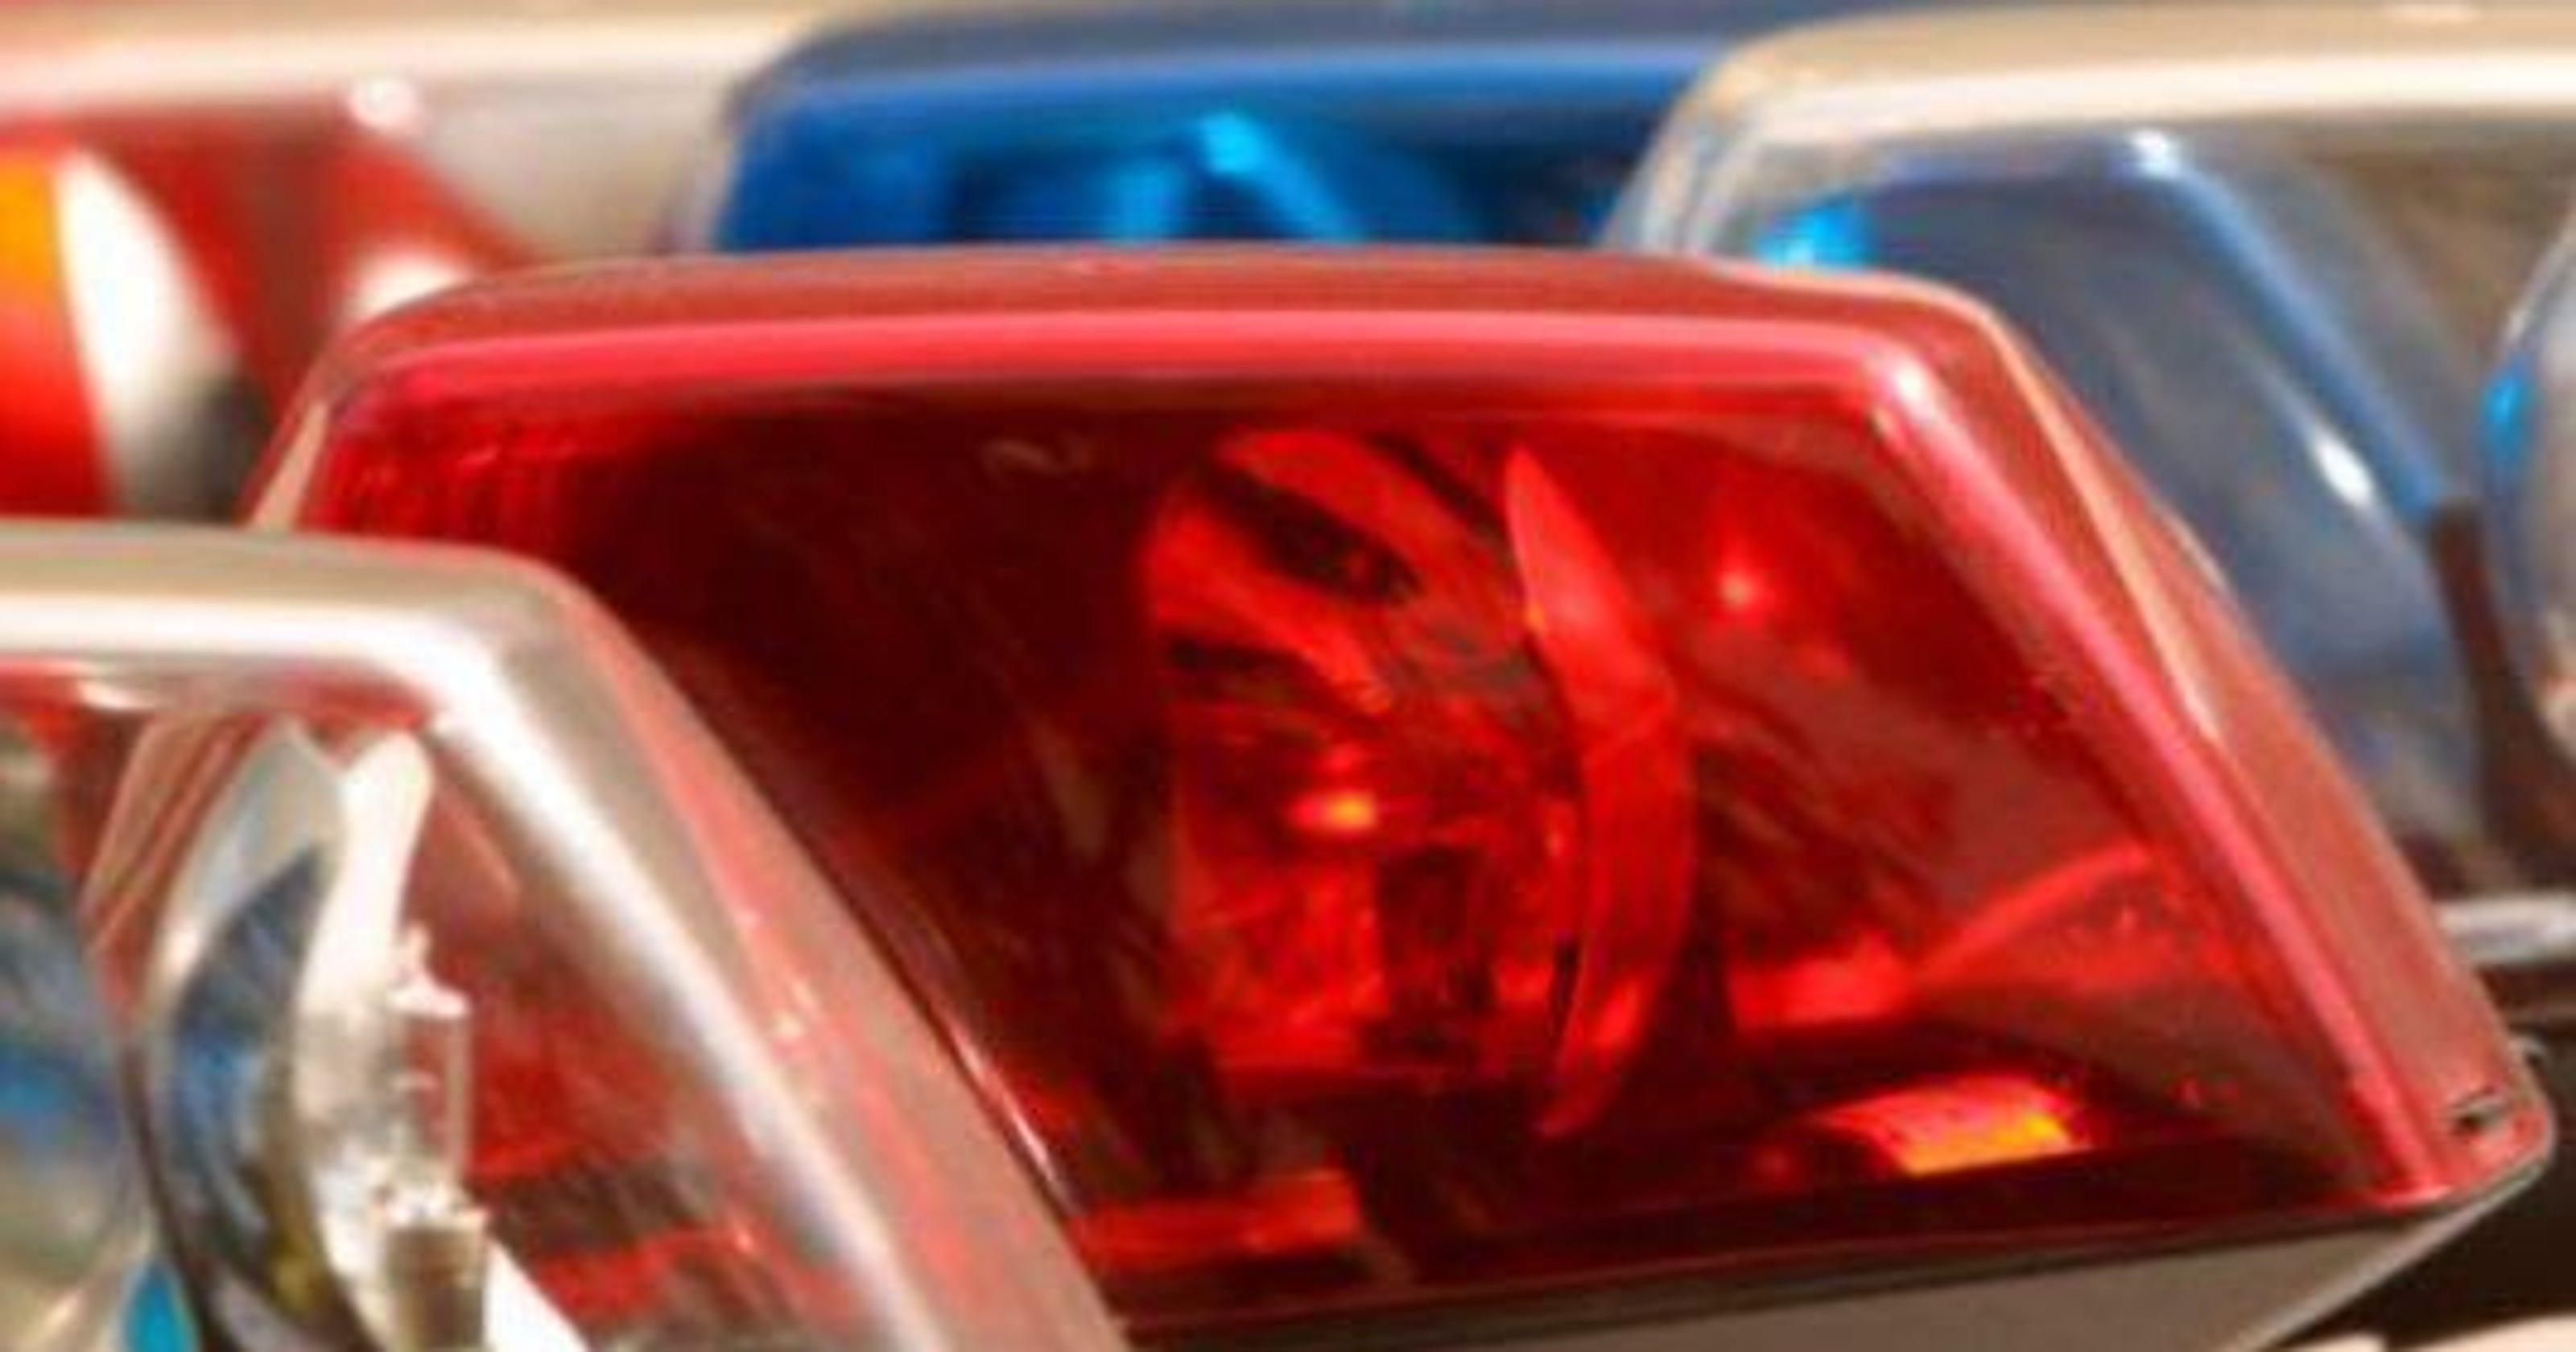 Motorcycle rider dies in wreck on I-24 in Clarksville